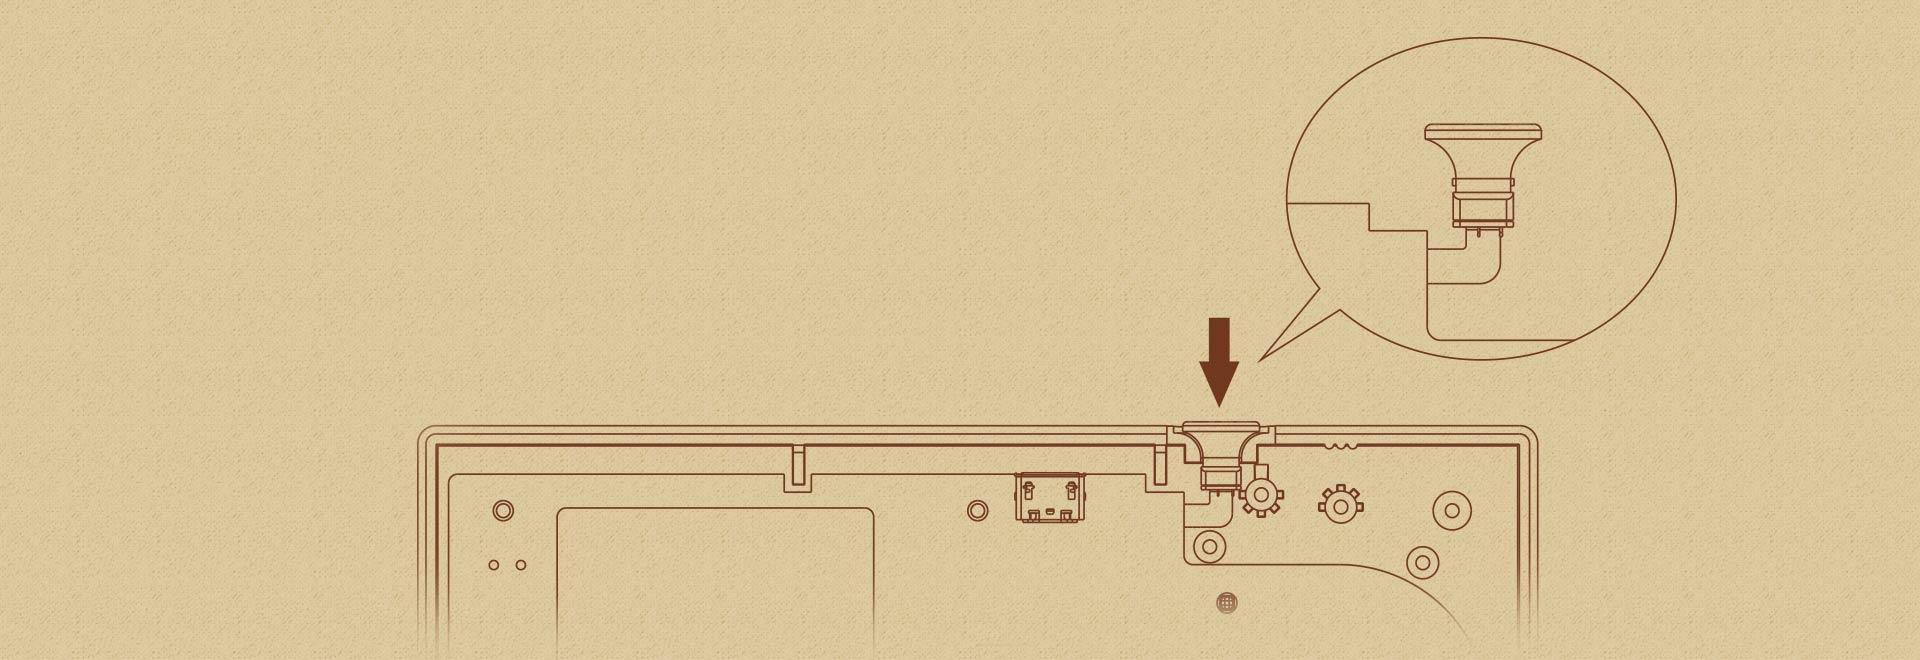 8BitDo Mod Kit for original NES controller | 8BitDo on